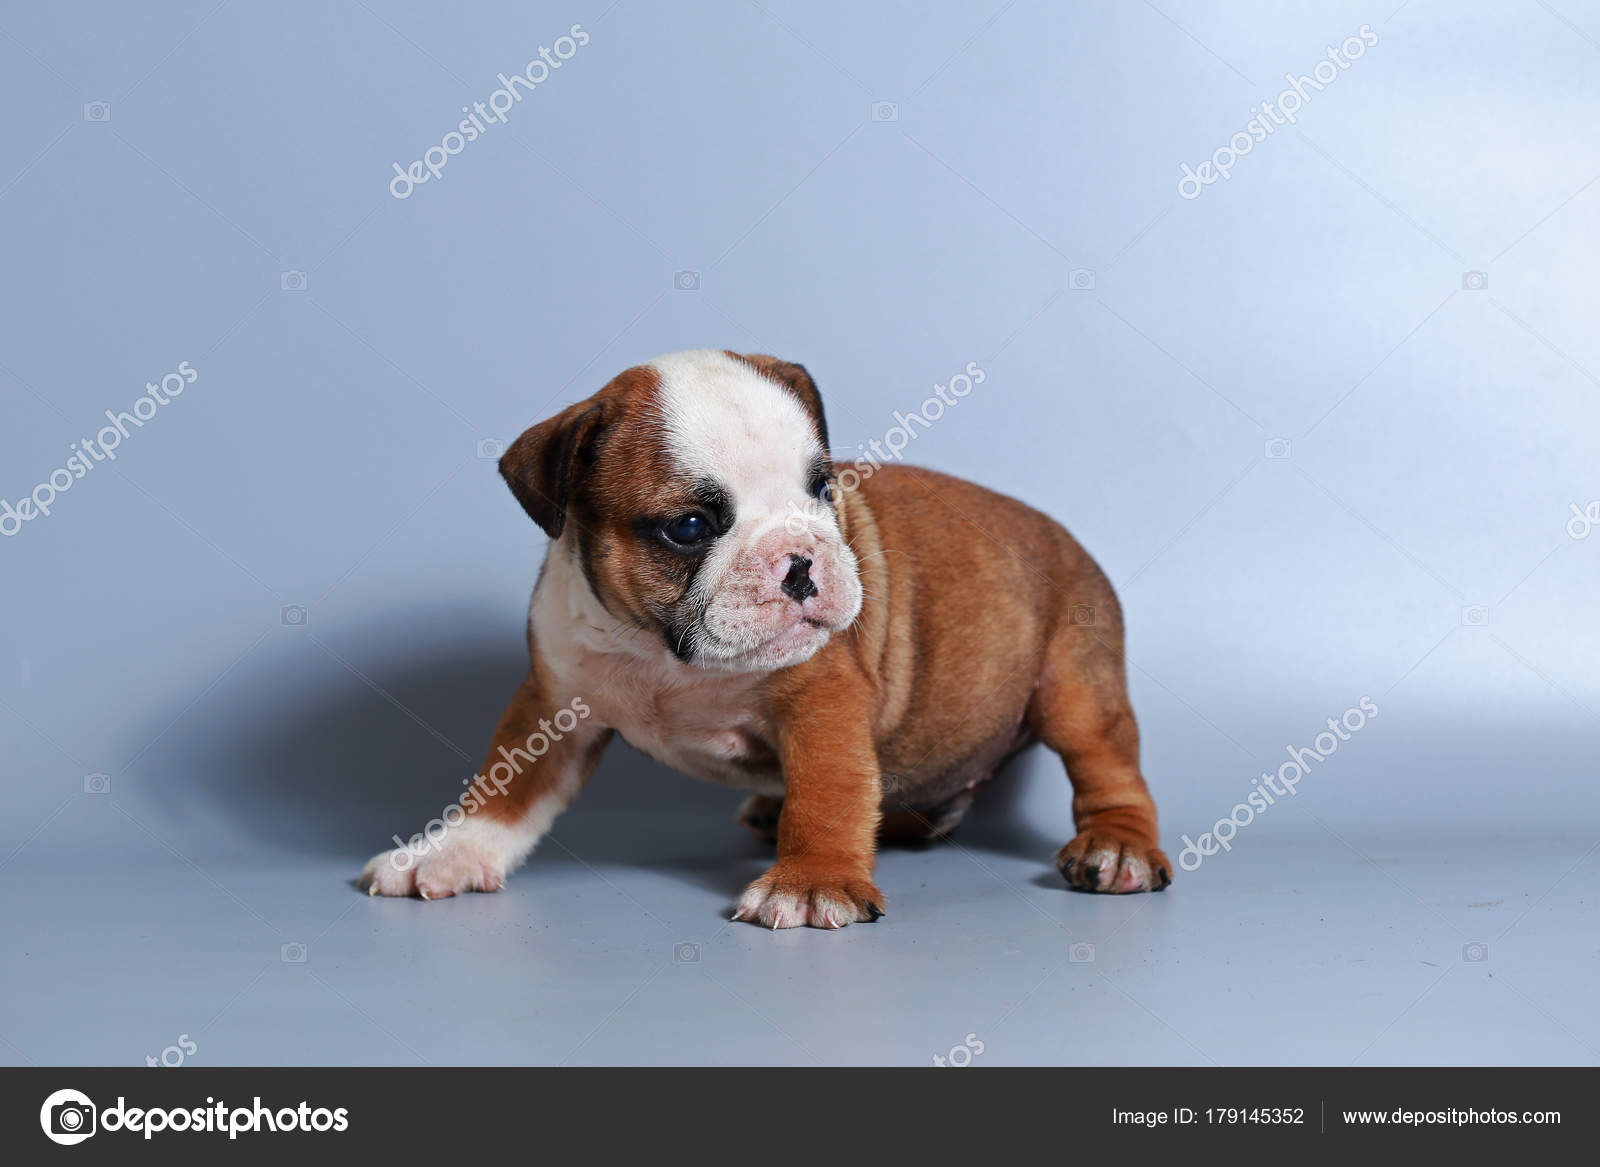 Month Purebred English Bulldog Puppy Gray Screen Stock Photo C S Thanawathreborn Gmail Com 179145352